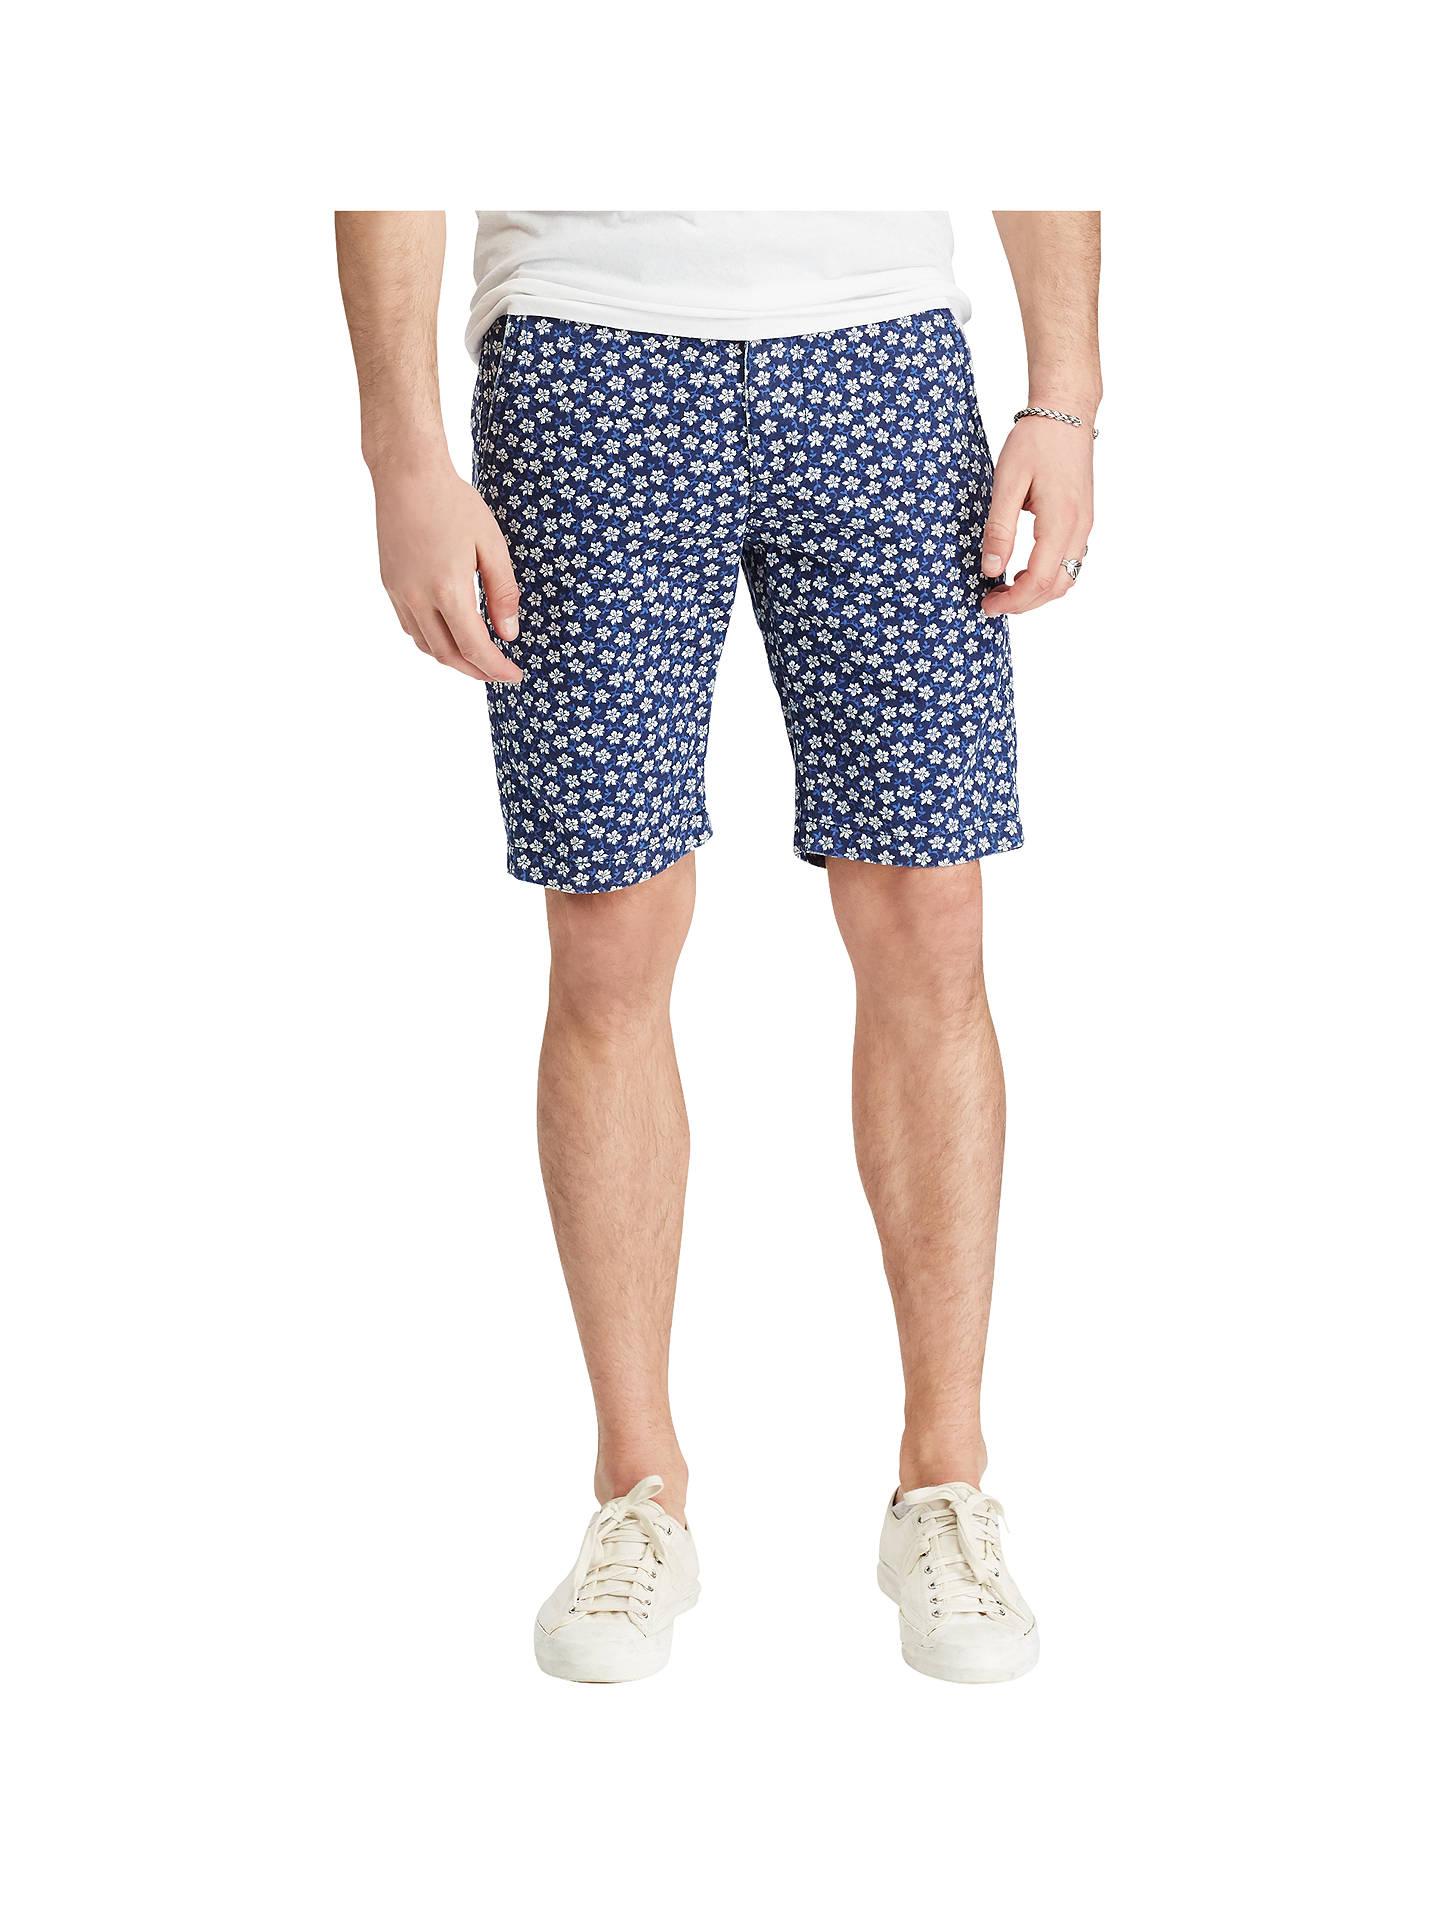 a950af18d26 Buy Denim   Supply Ralph Lauren Floral Print Chino Shorts